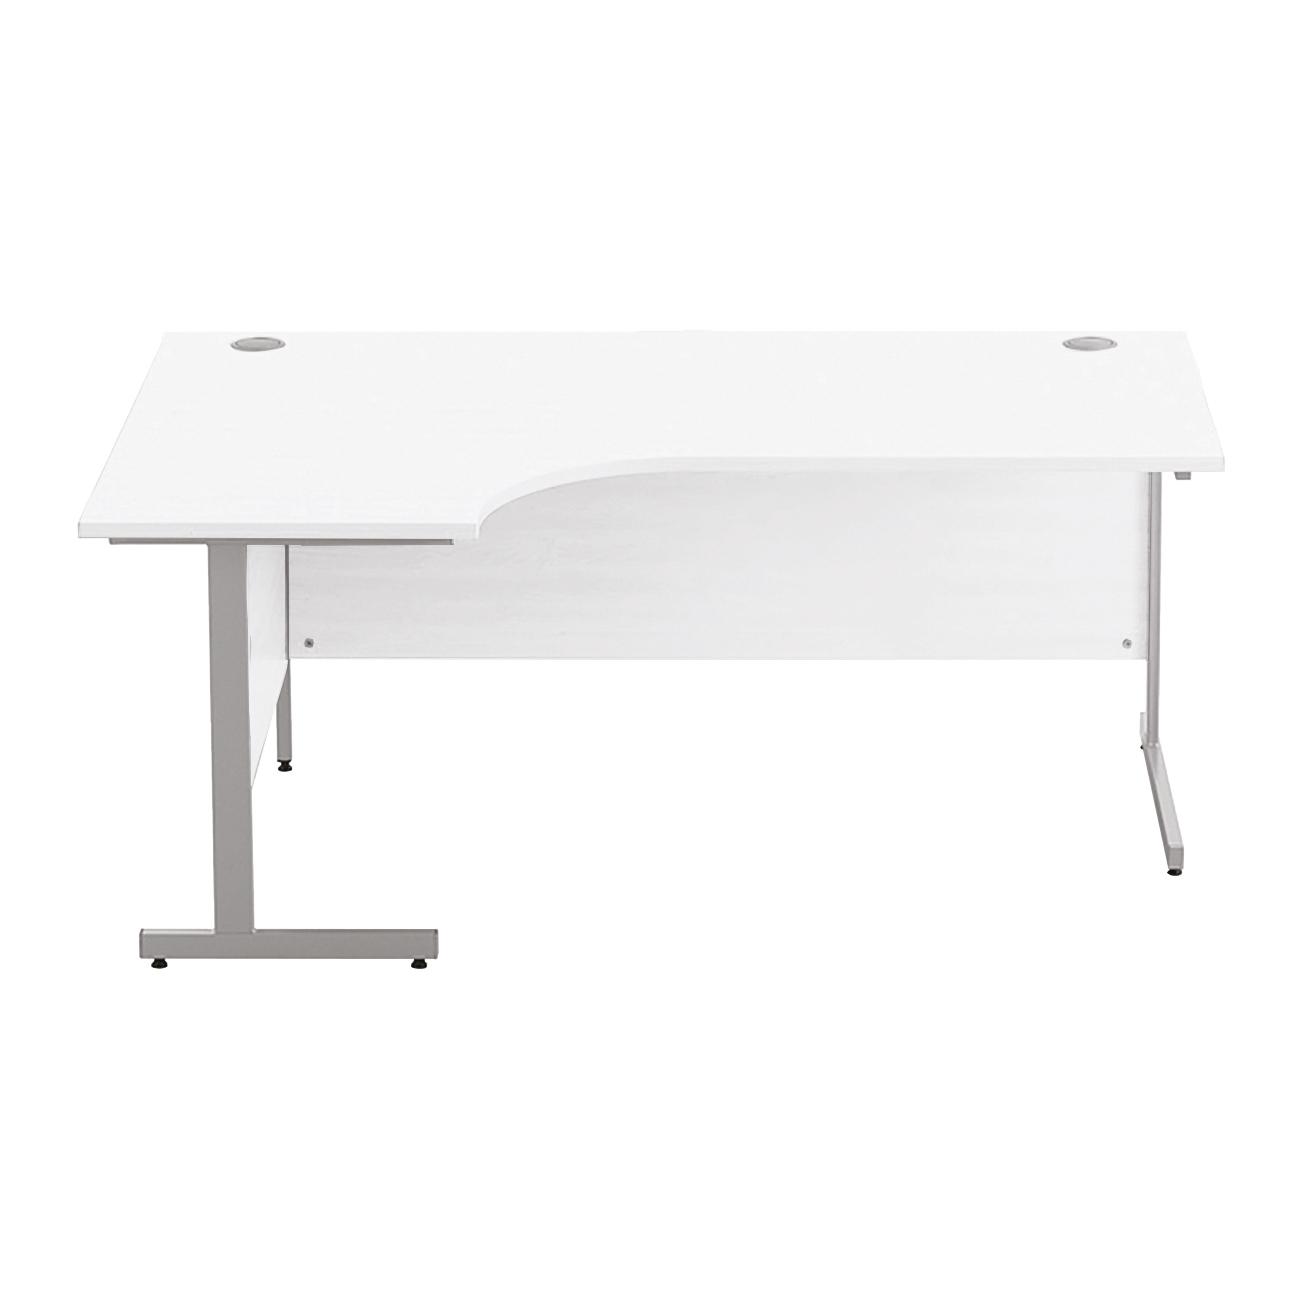 Sonix Premium Radial Desk Left Hand Silver Cantilever Leg 1800mm Polar White Ref w9971lwh